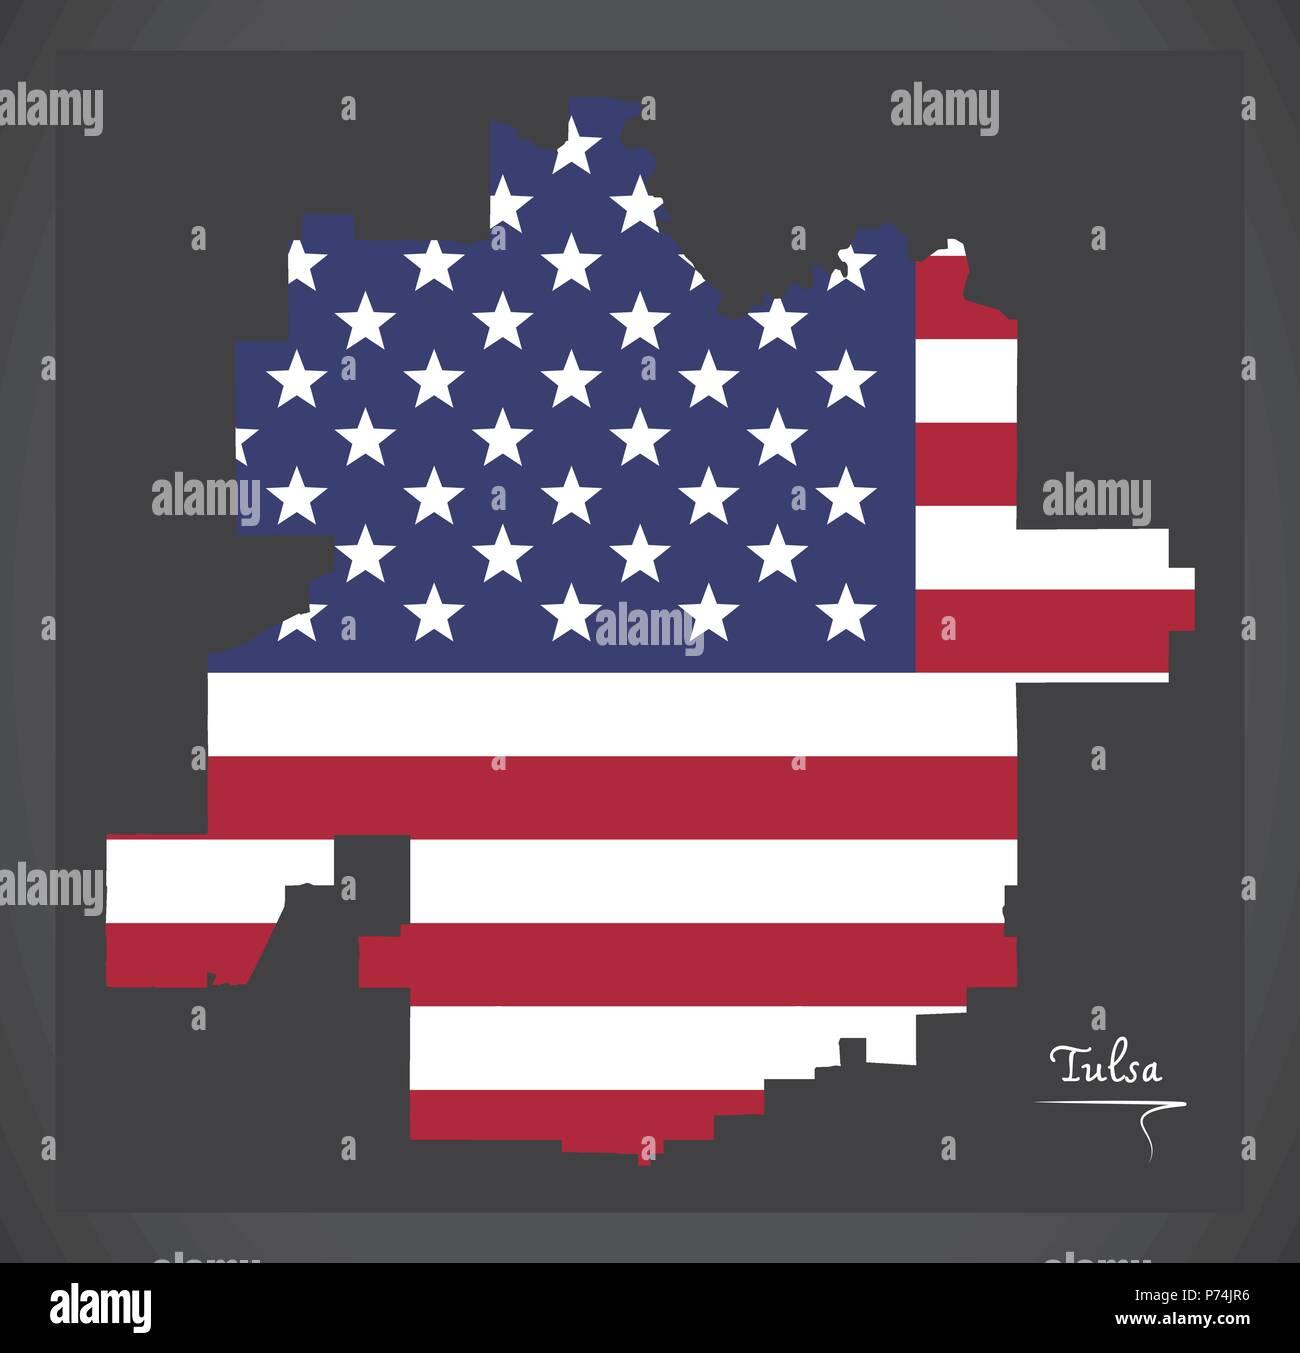 Flag Of Tulsa Stockfotos & Flag Of Tulsa Bilder - Alamy